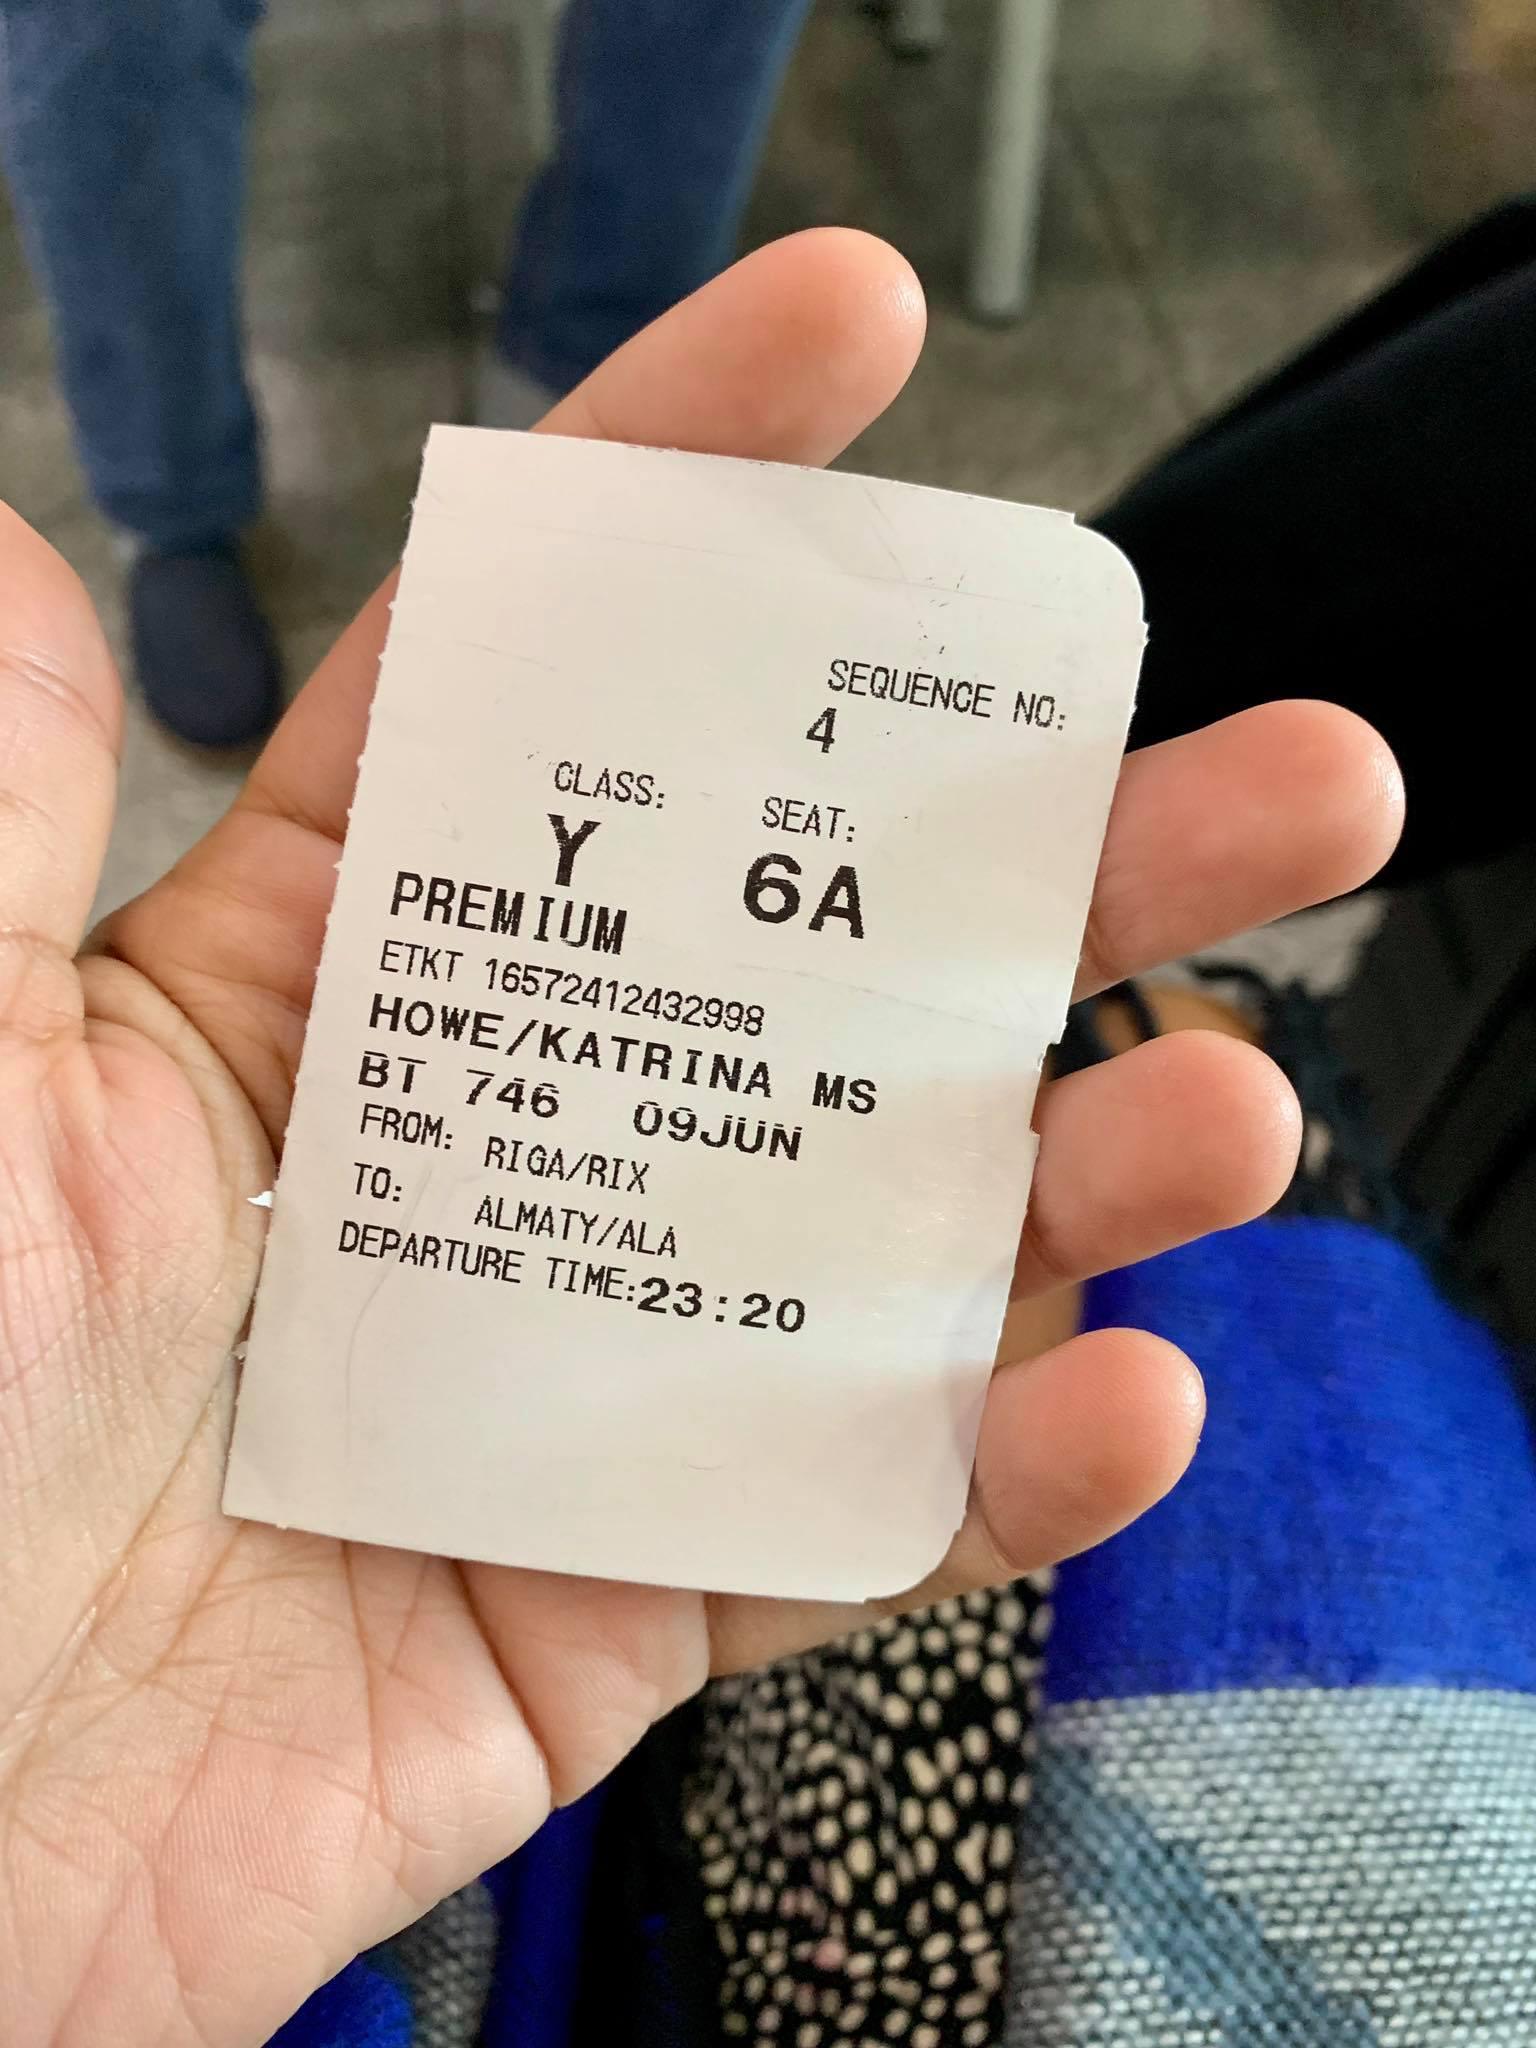 Kach Solo Travels in 2019 I just arrived in Dushanbe, Tajikistan22.jpg